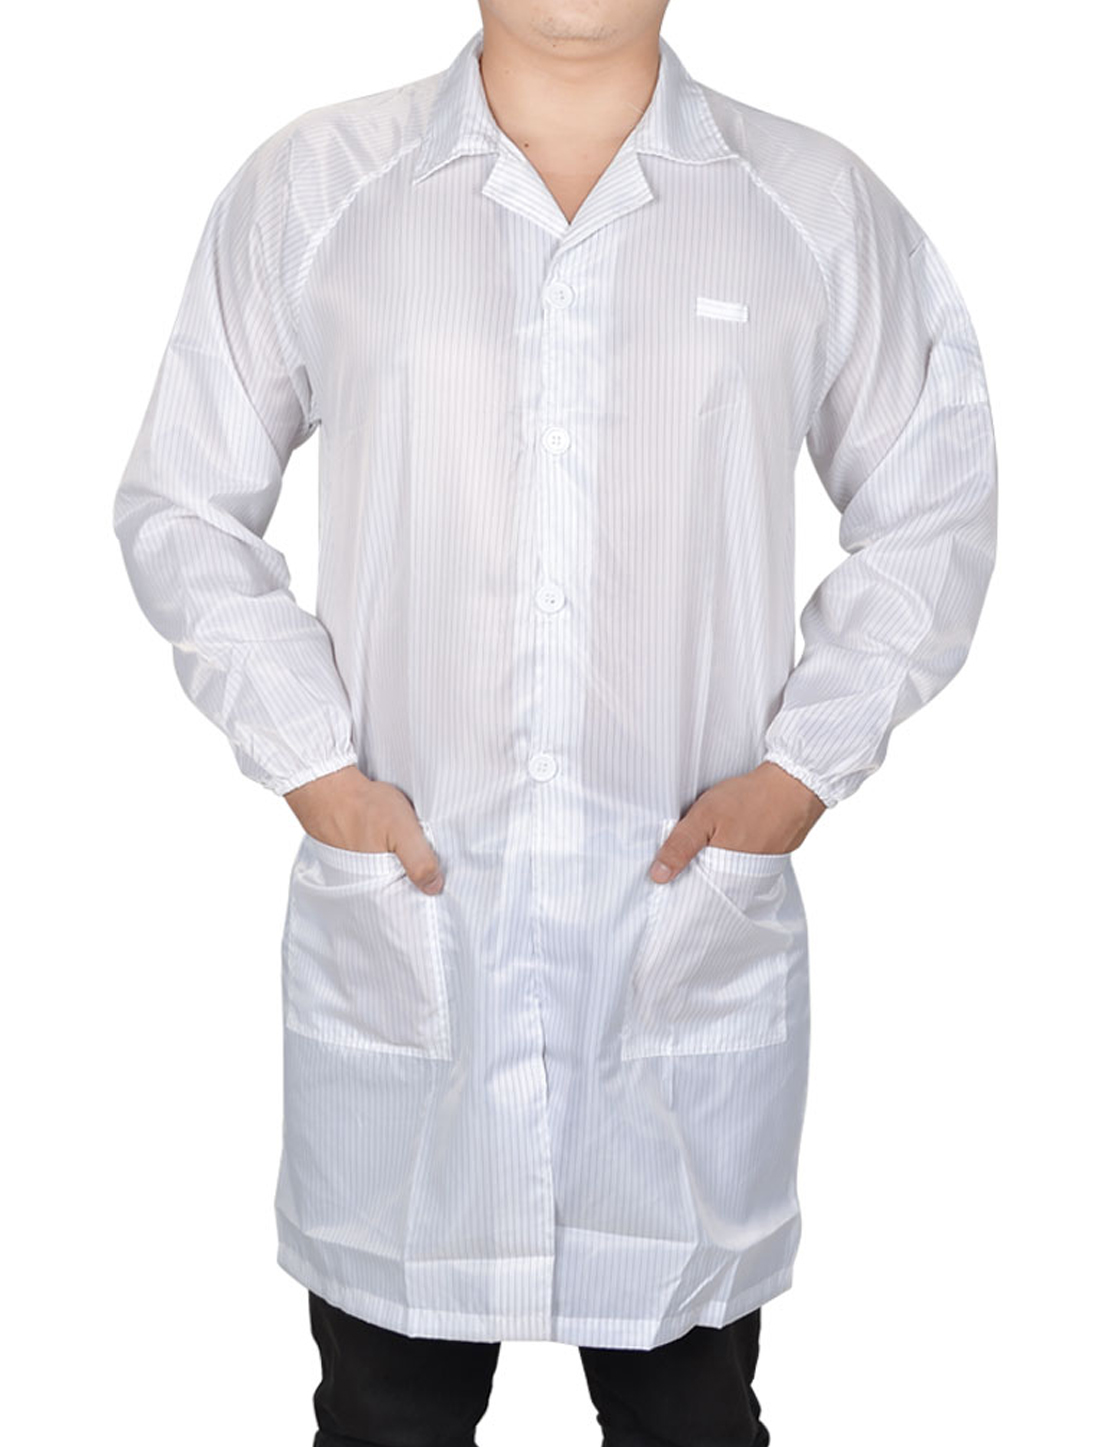 Unisex Striped Button Closure Anti Static Overall Gown Garment White M